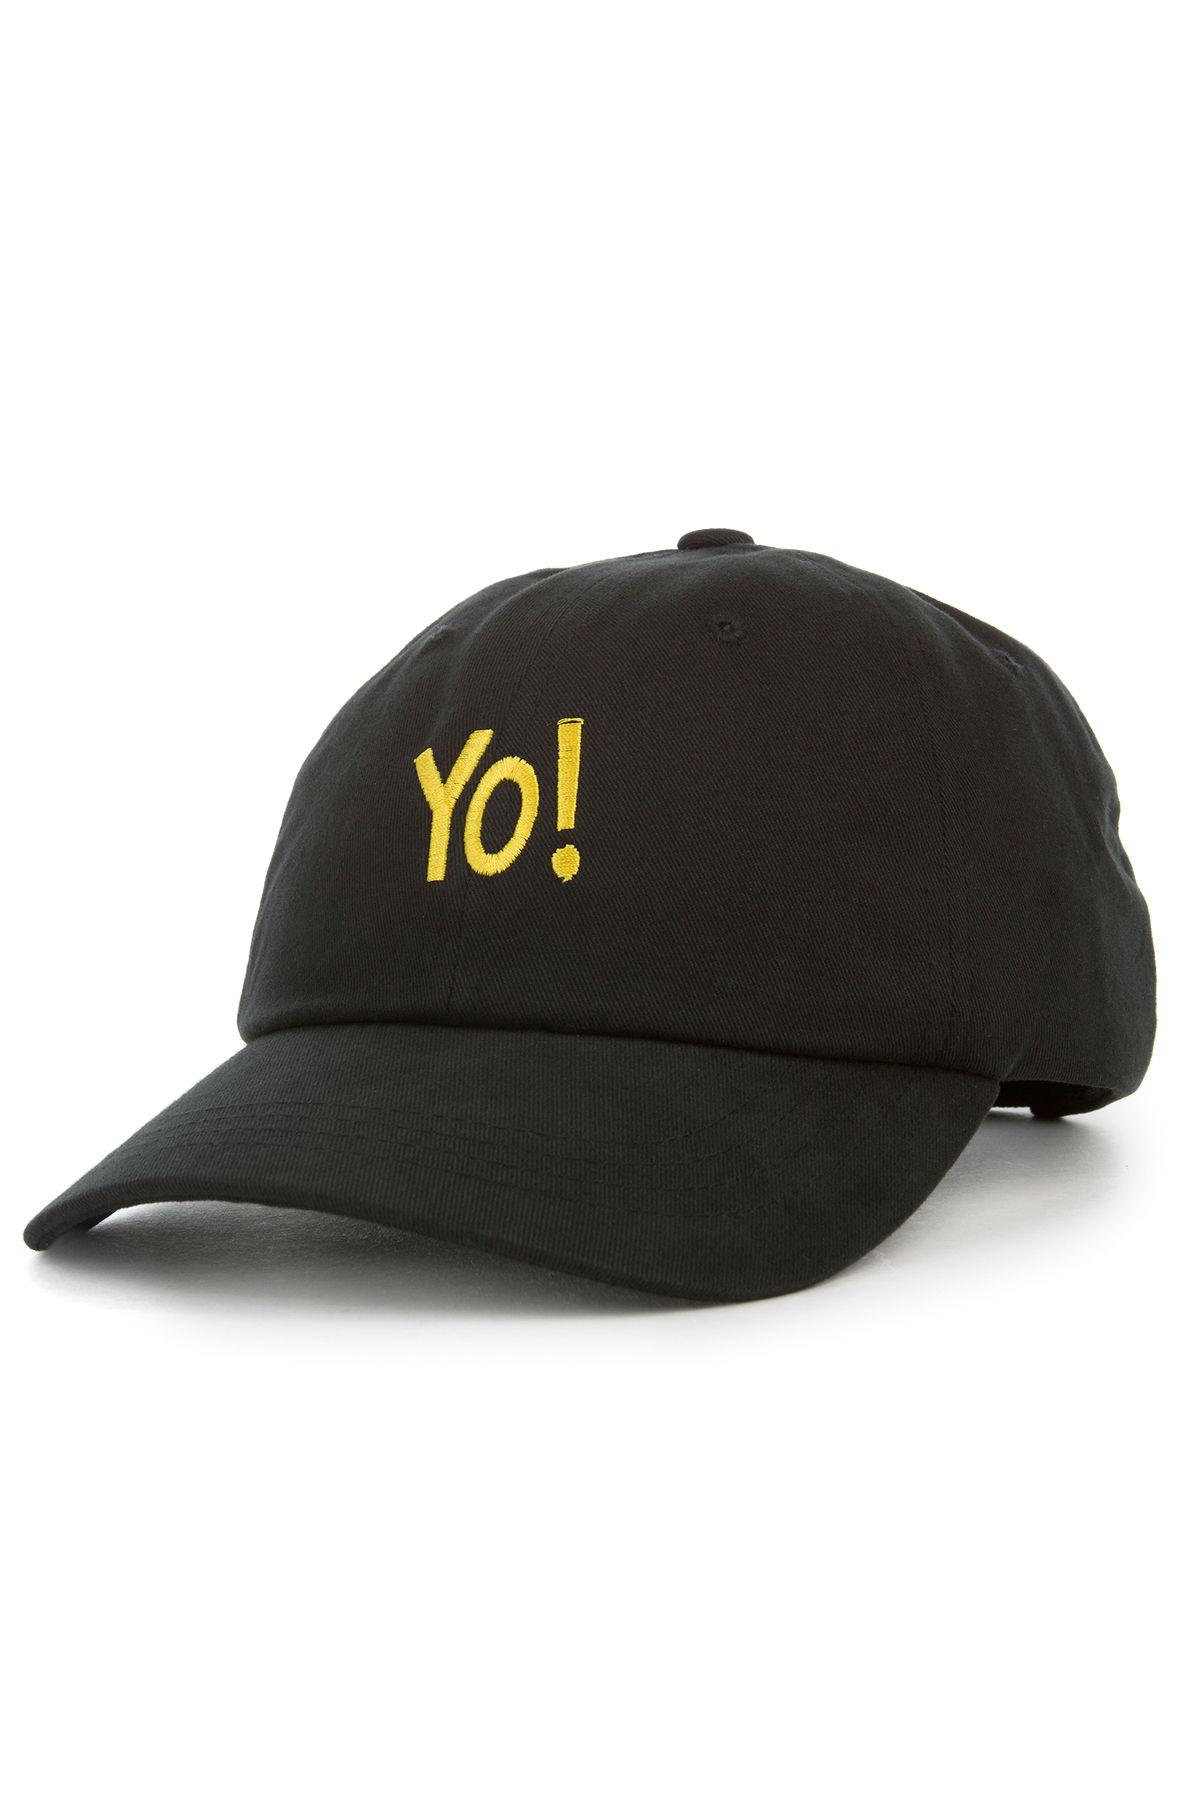 Image of The Hip Hop Dad Hat in Black